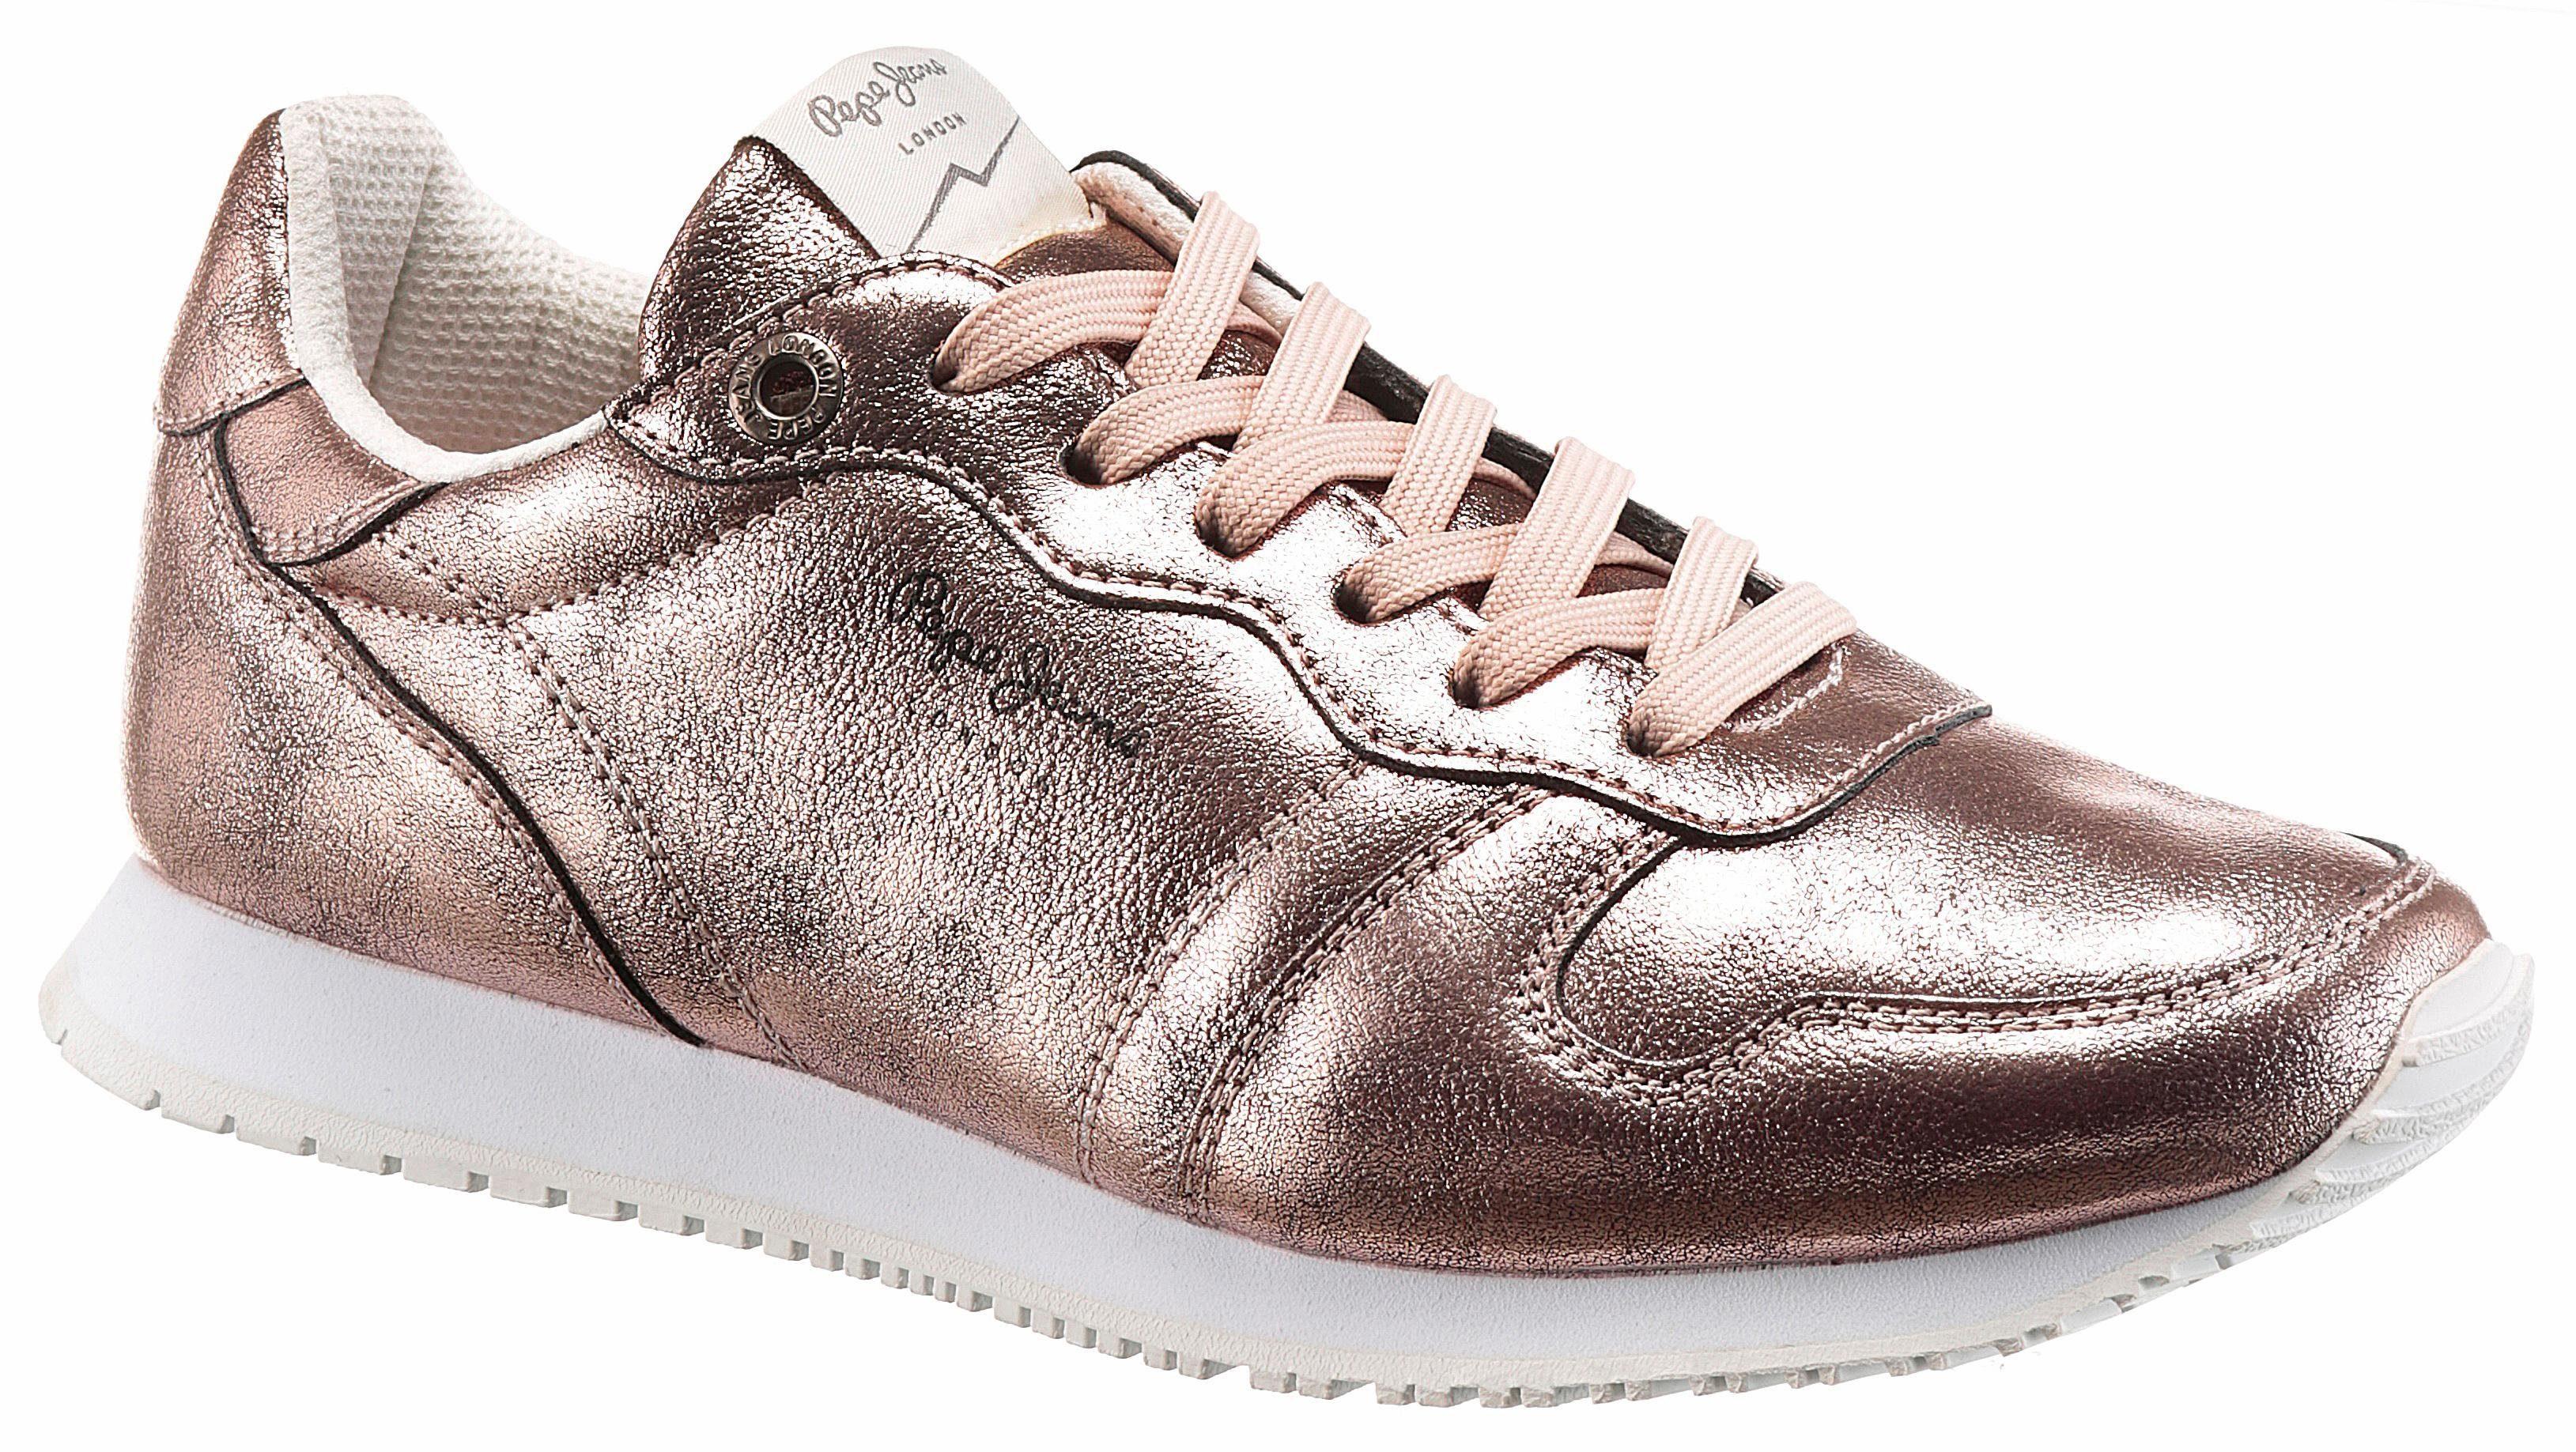 Pepe Jeans »Gable Plain« Sneaker, im trendigen Metallic-Look, rosa, rosé